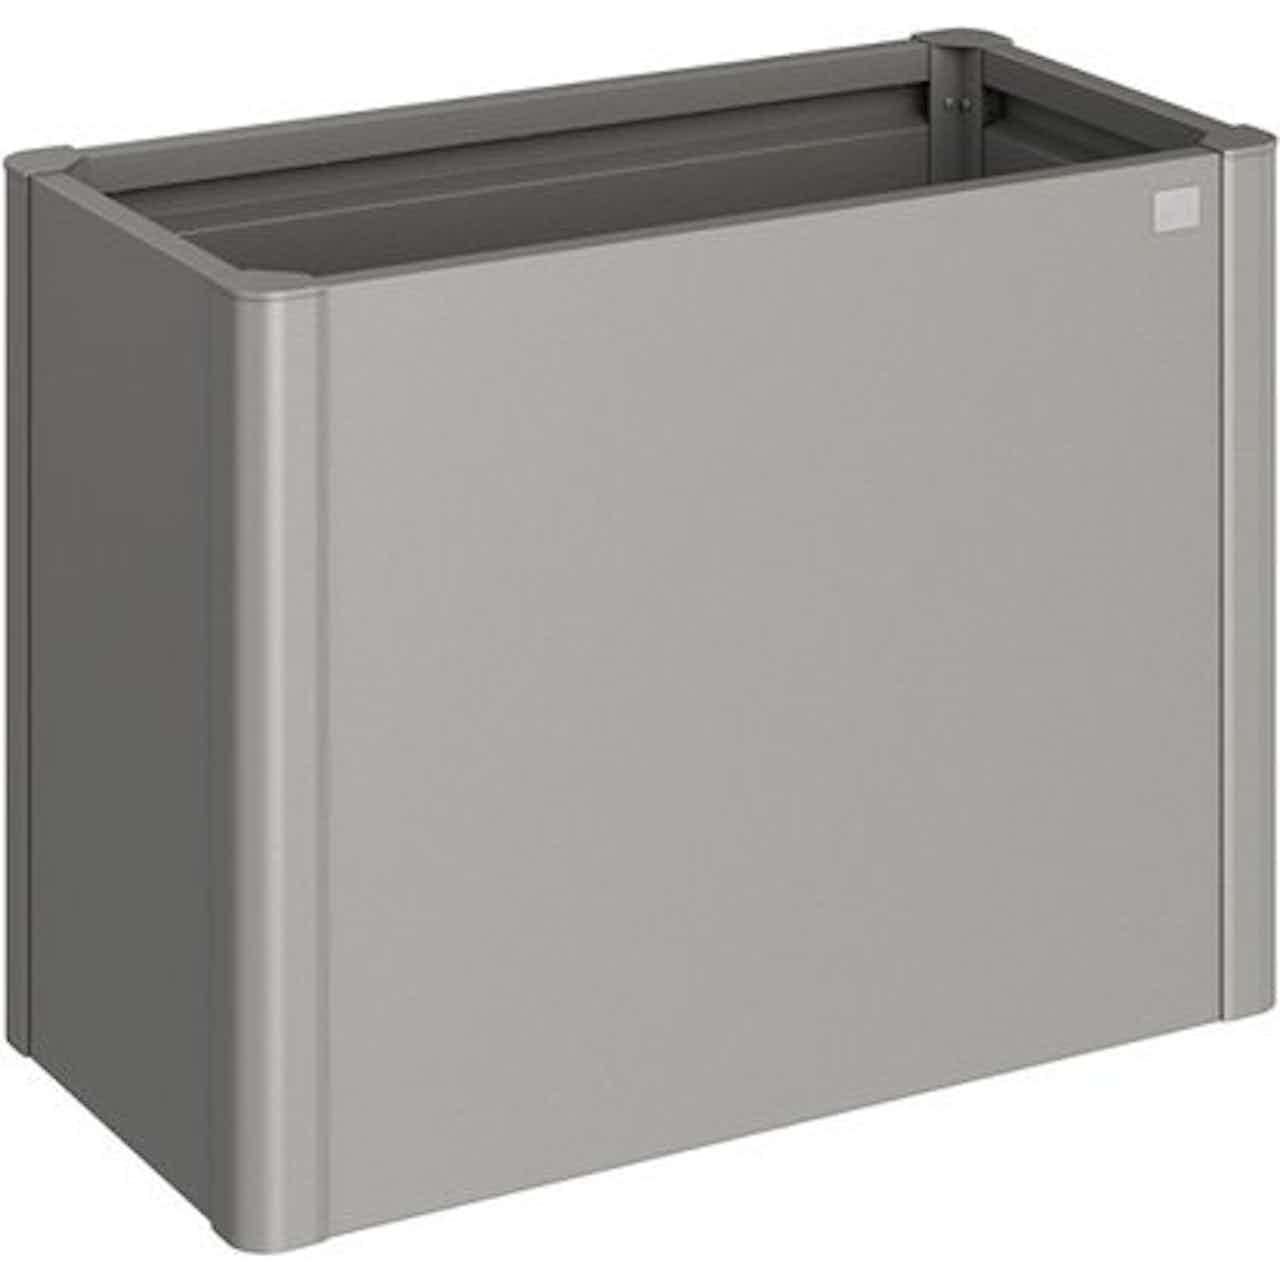 Biohort Metall-Hochbeet 77 cm x 102 cm x 53 cm Quarzgrau-Metallic